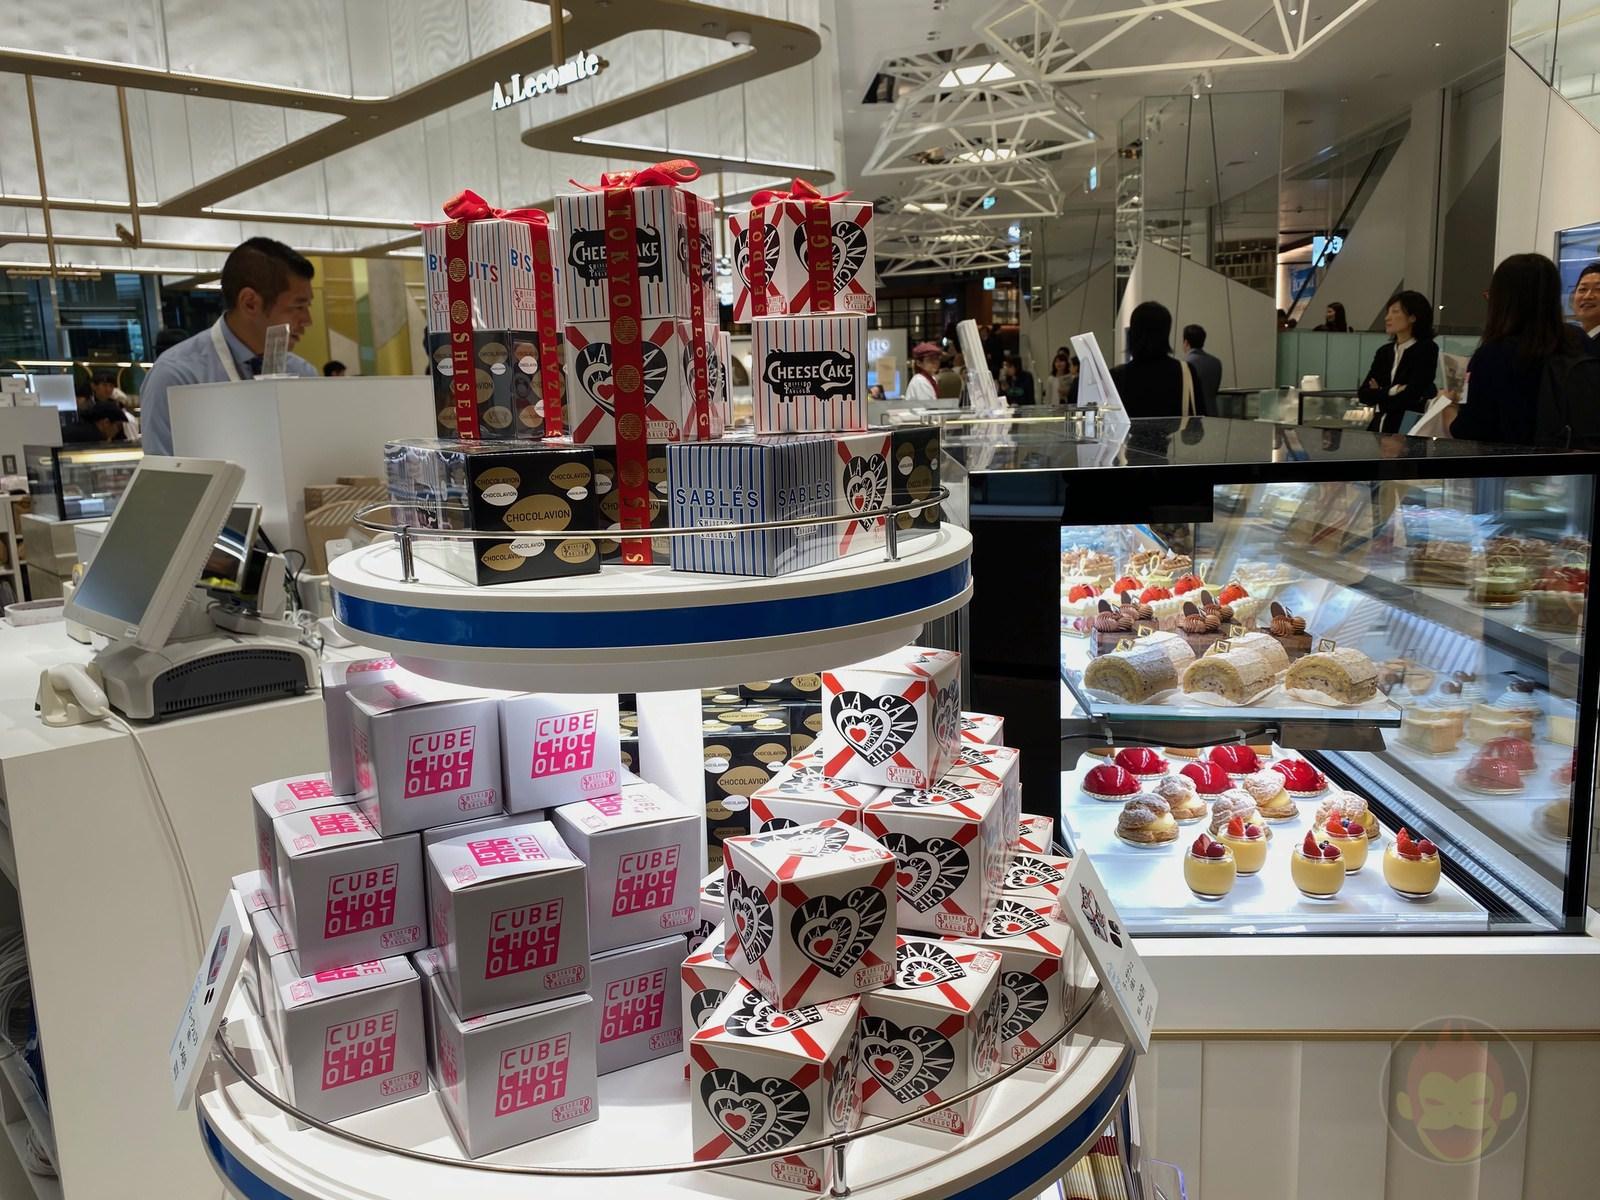 Shibuya-Scramble-Square-Food-I-Ate-64.jpeg